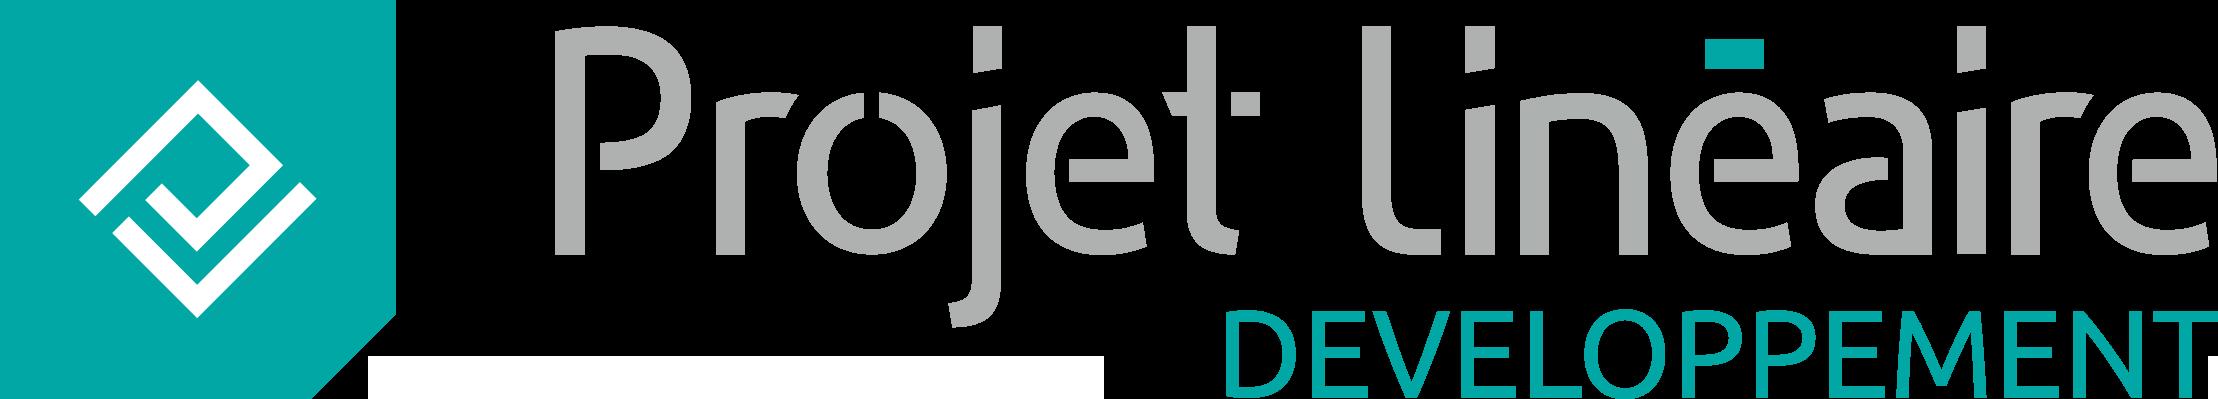 pl_dev-logo-cs6-1ok